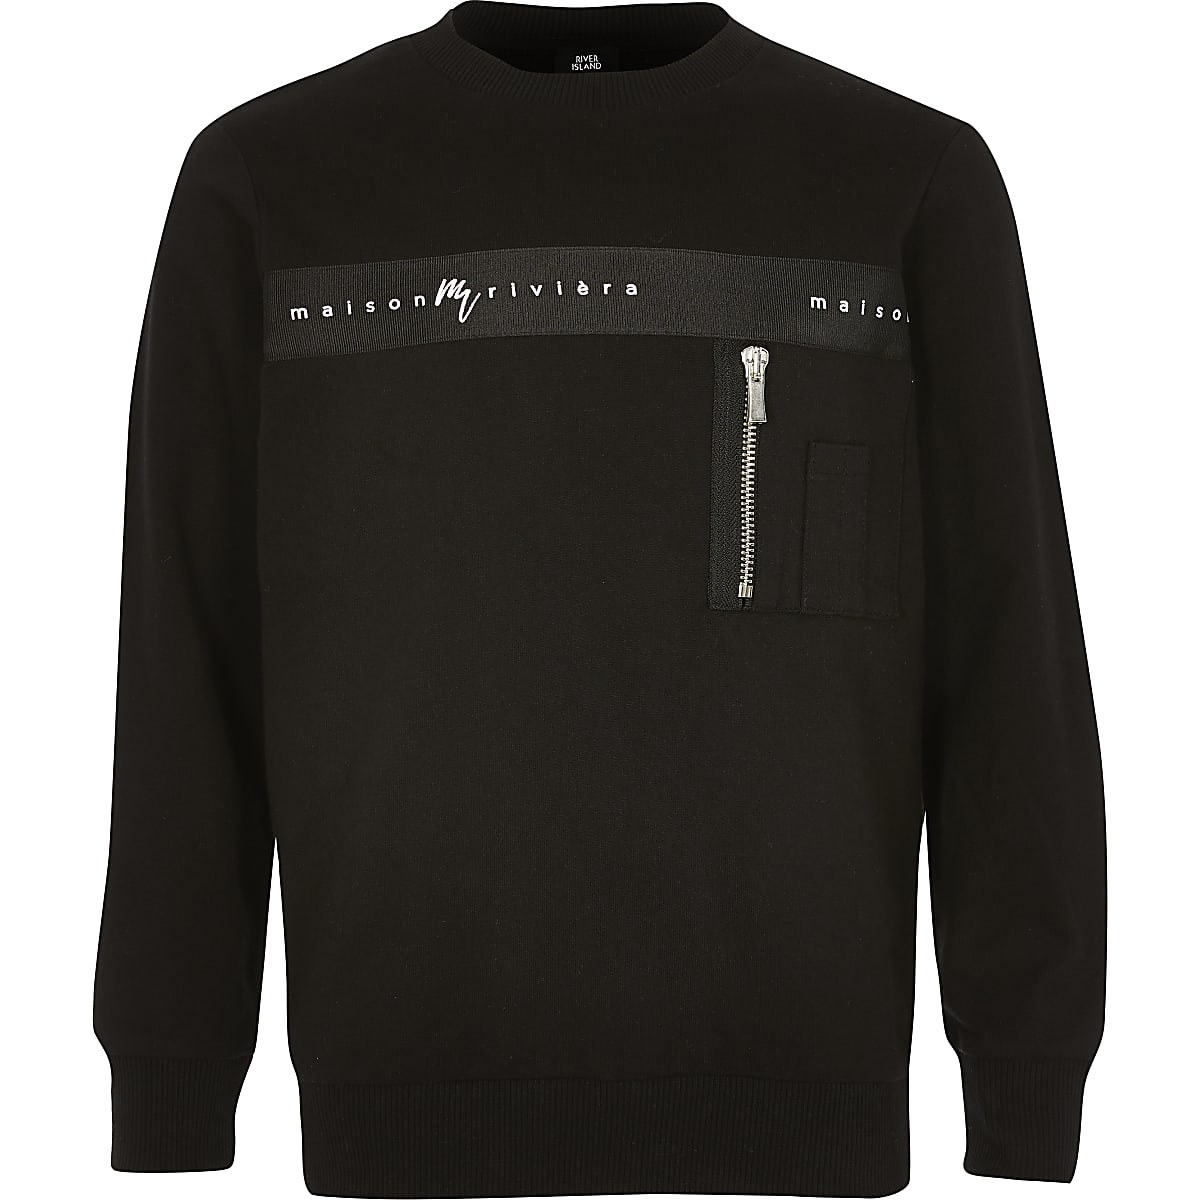 Boys black 'Maison riviera' tape sweatshirt